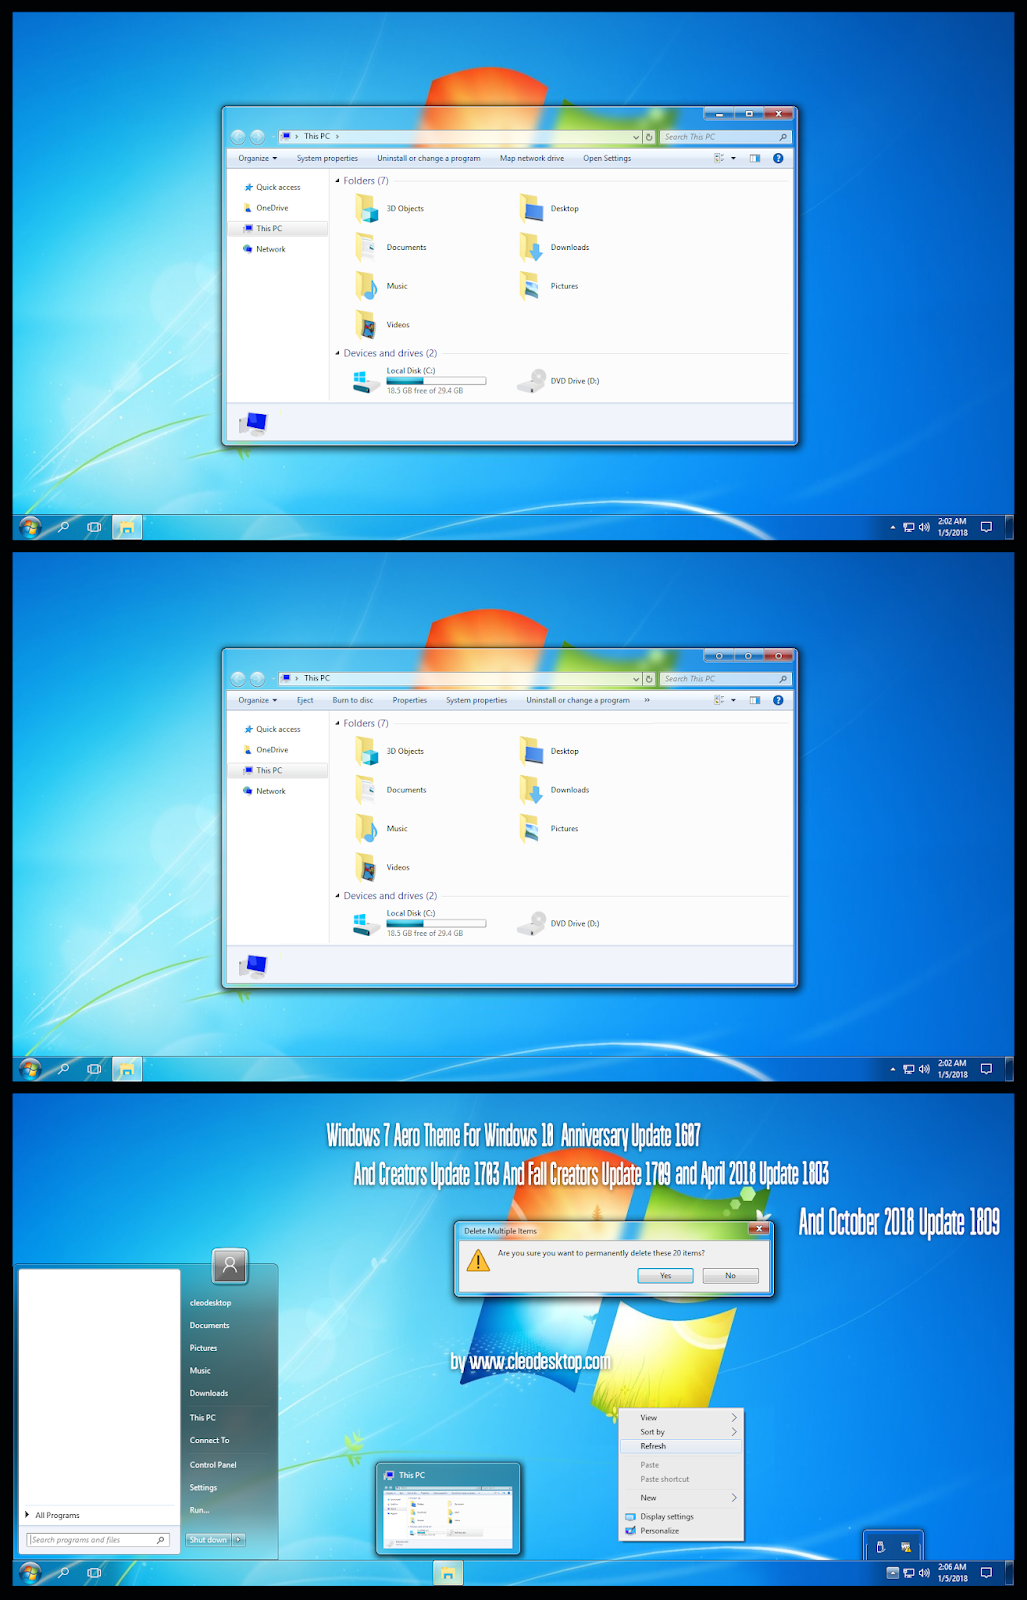 Windows 7 Aero Theme Windows10 October 2018 Update 1809 Windows10 Themes I Cleodesktop Windows Windows Aero Theme